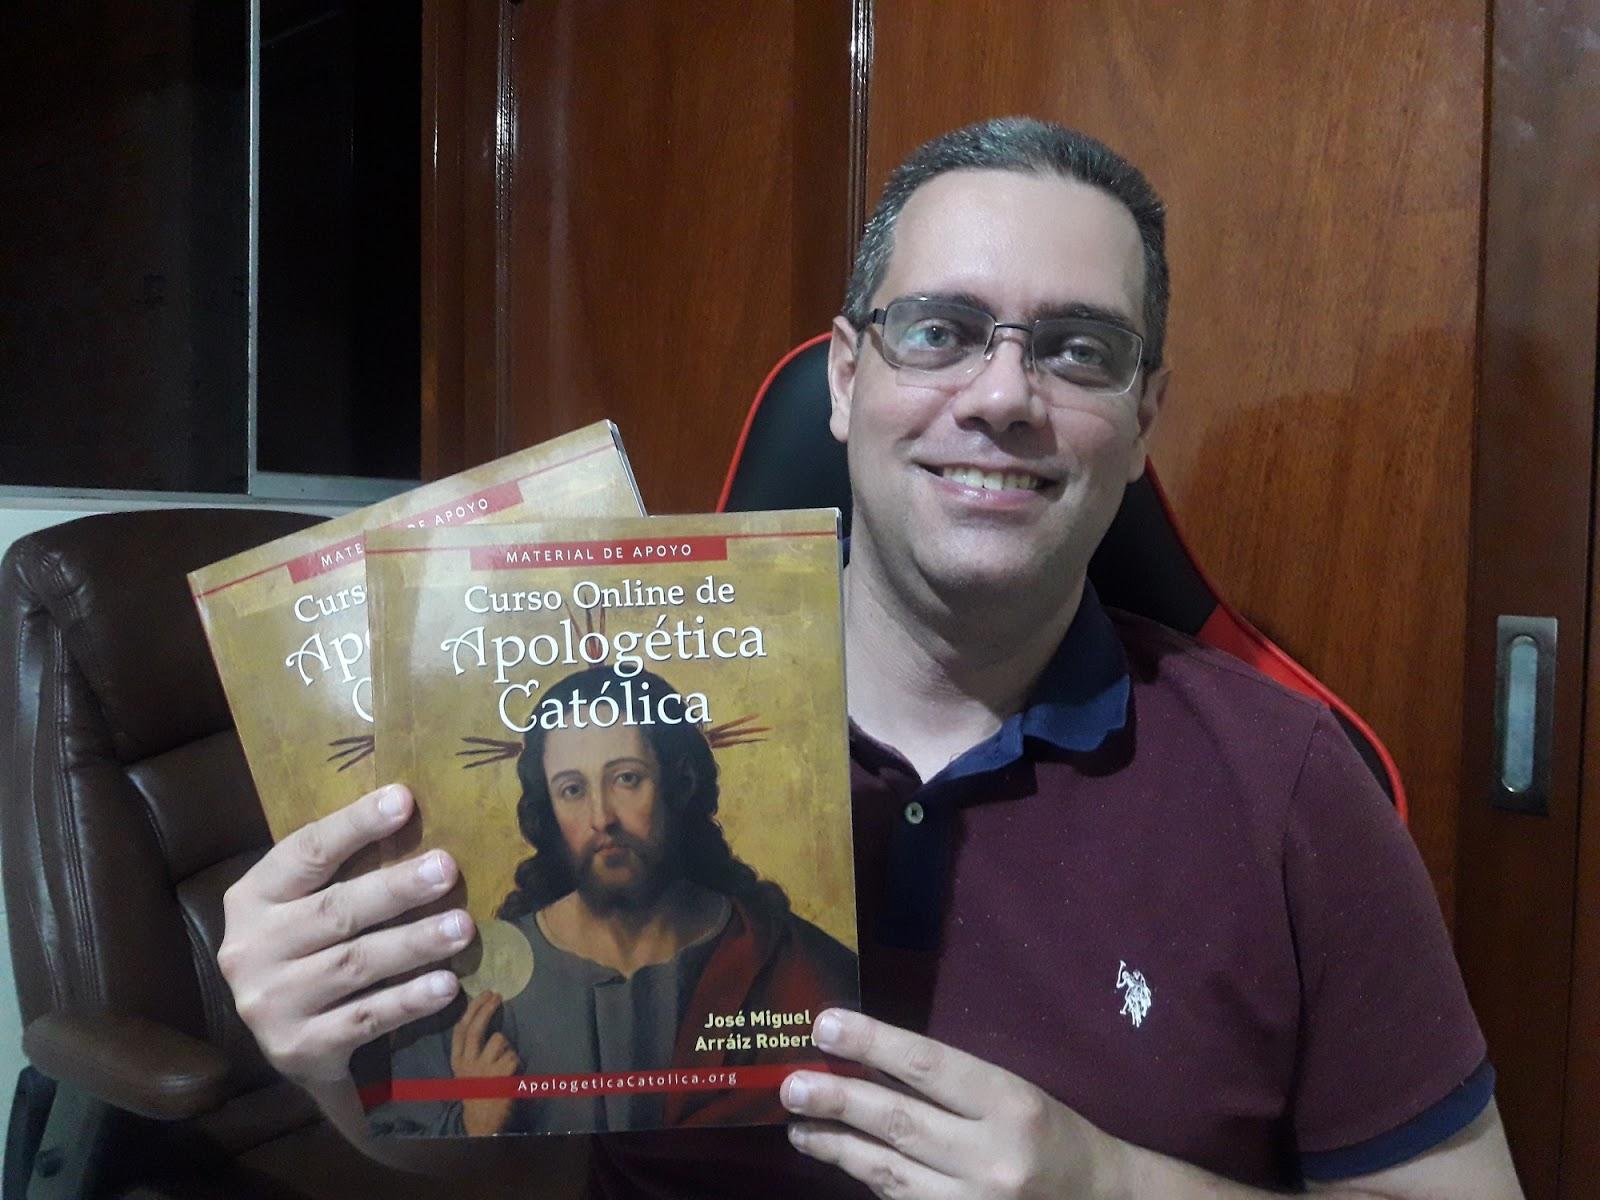 Material de apoyo - Curso Online de Apologética Católica